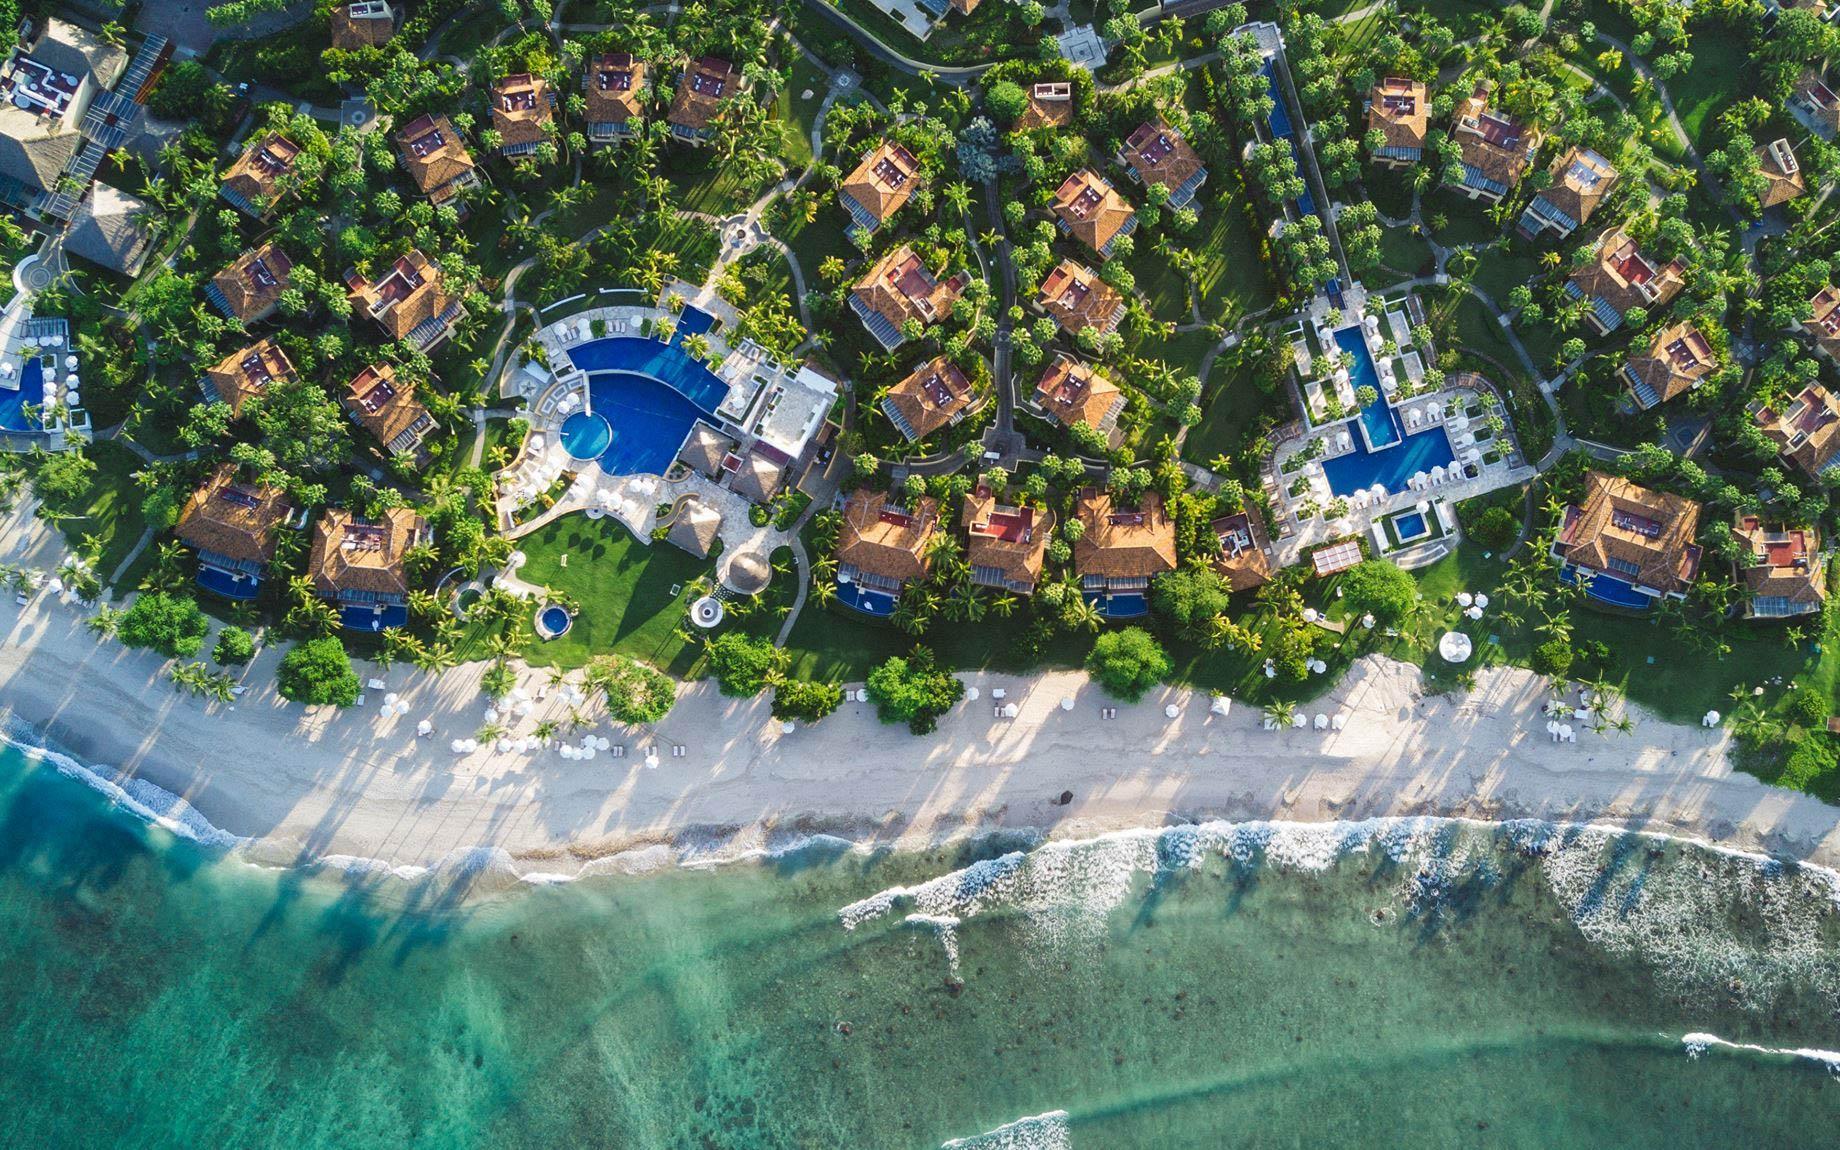 The St. Regis Punta Mita Luxury Resort - Nayarit, Mexico